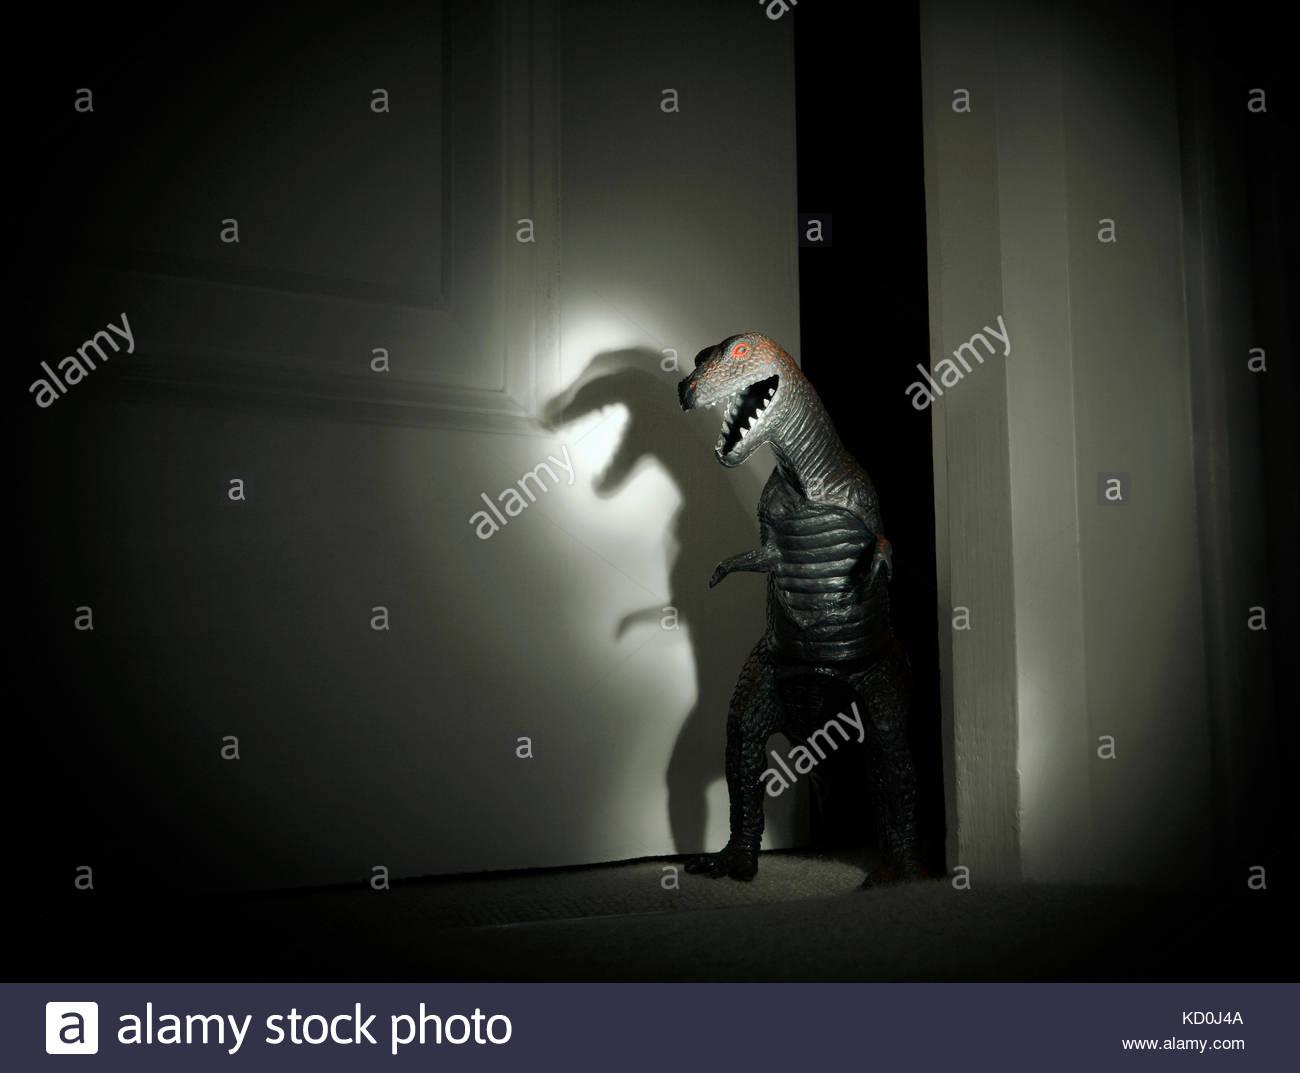 Toy dinosaur spotlit in darkened doorway - Stock Image